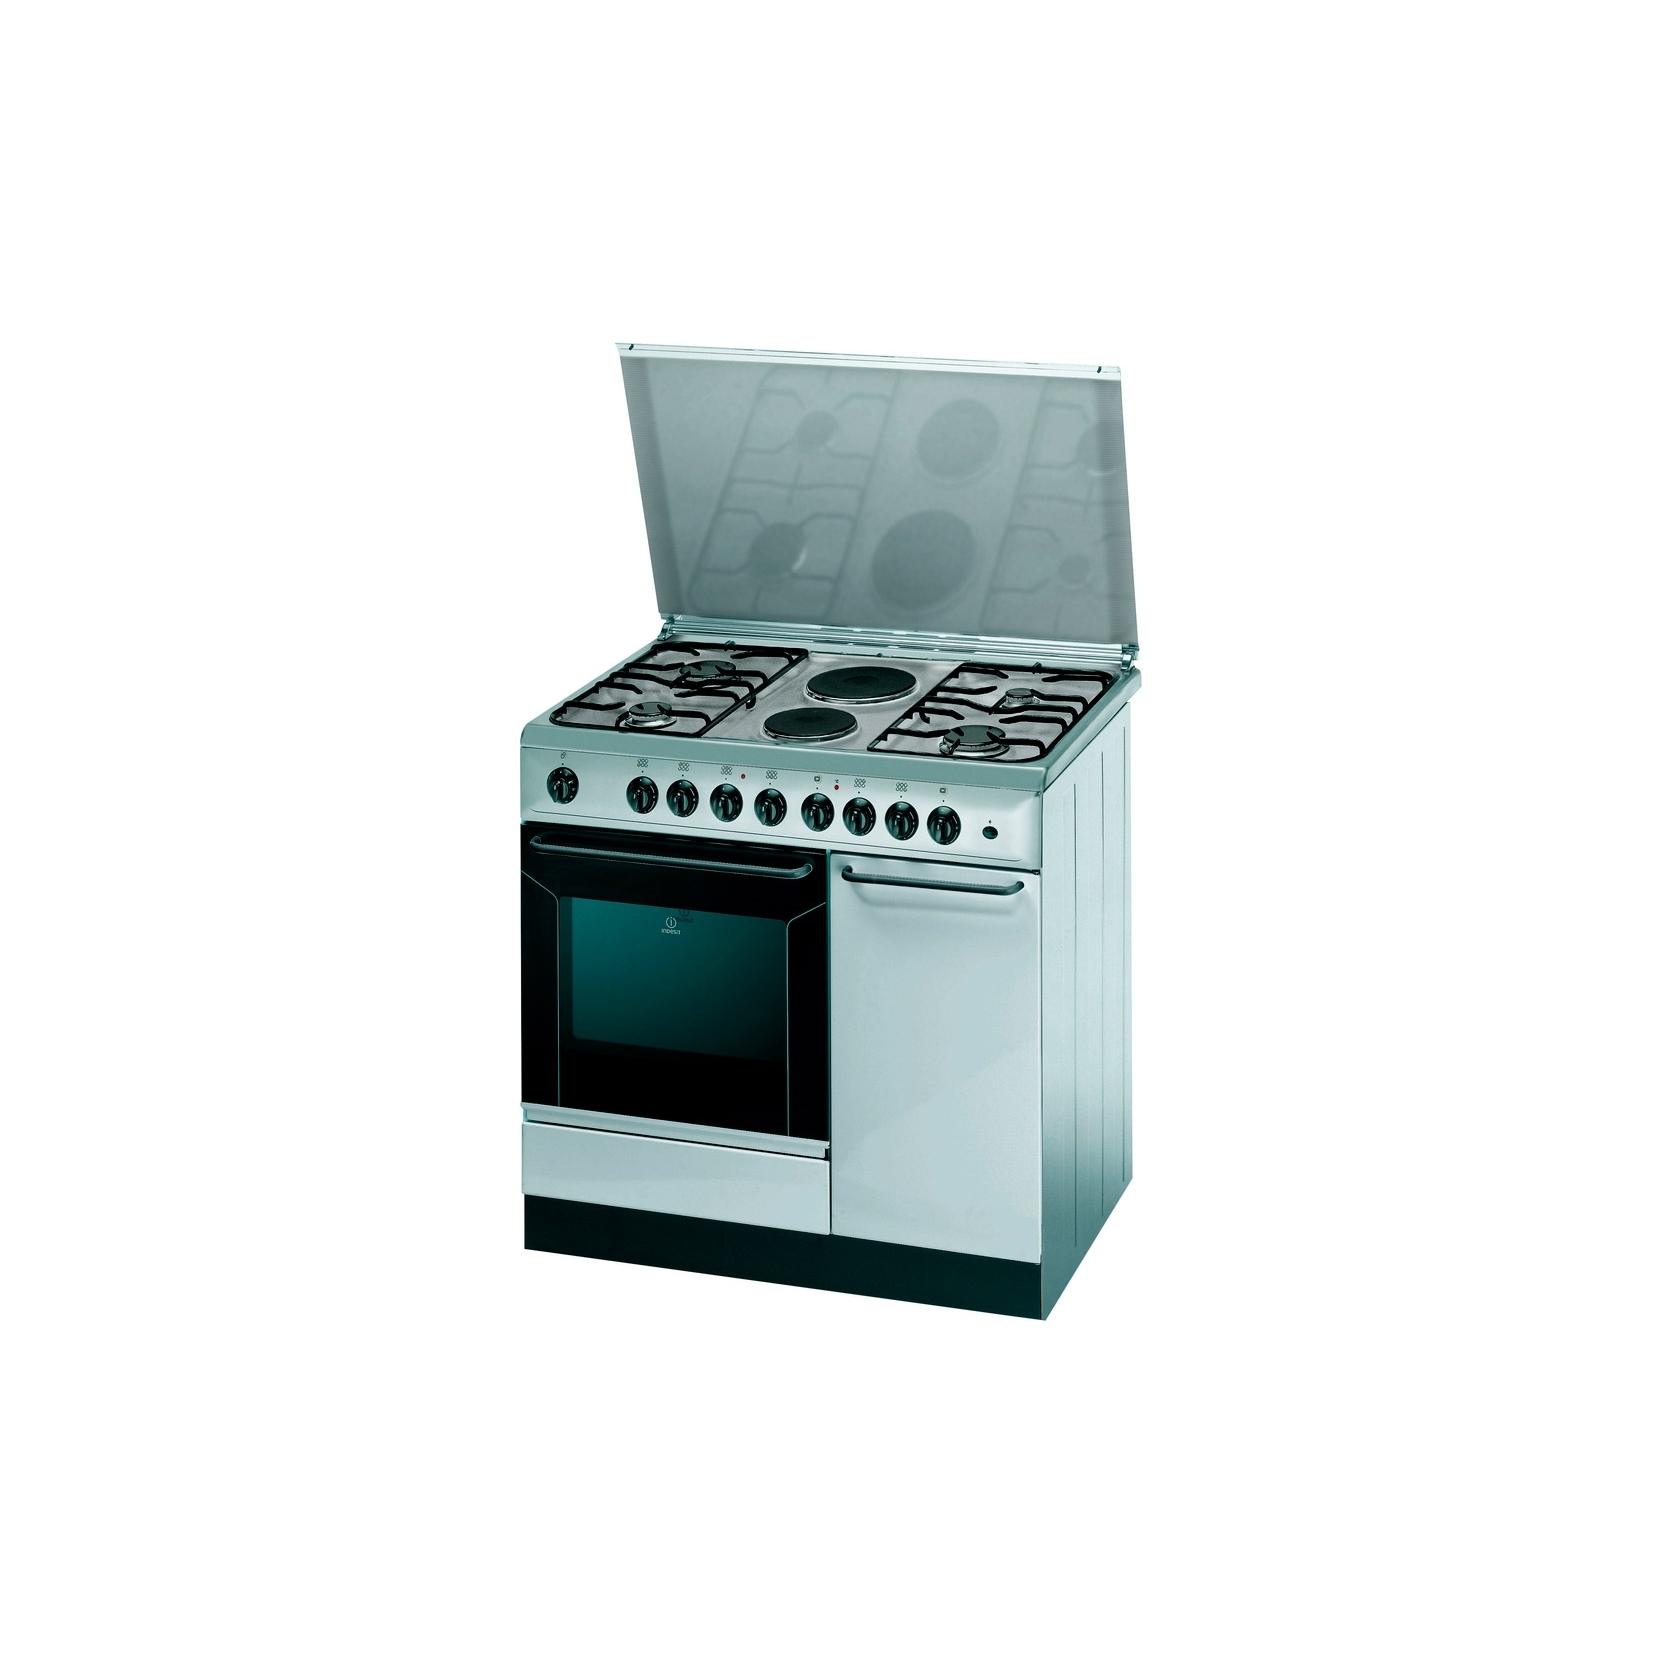 Cucina indesit k9b11sb x i con p bombola 90x60 inox 4 fuochi 2 piastre elettriche - Cucine a gas indesit ...